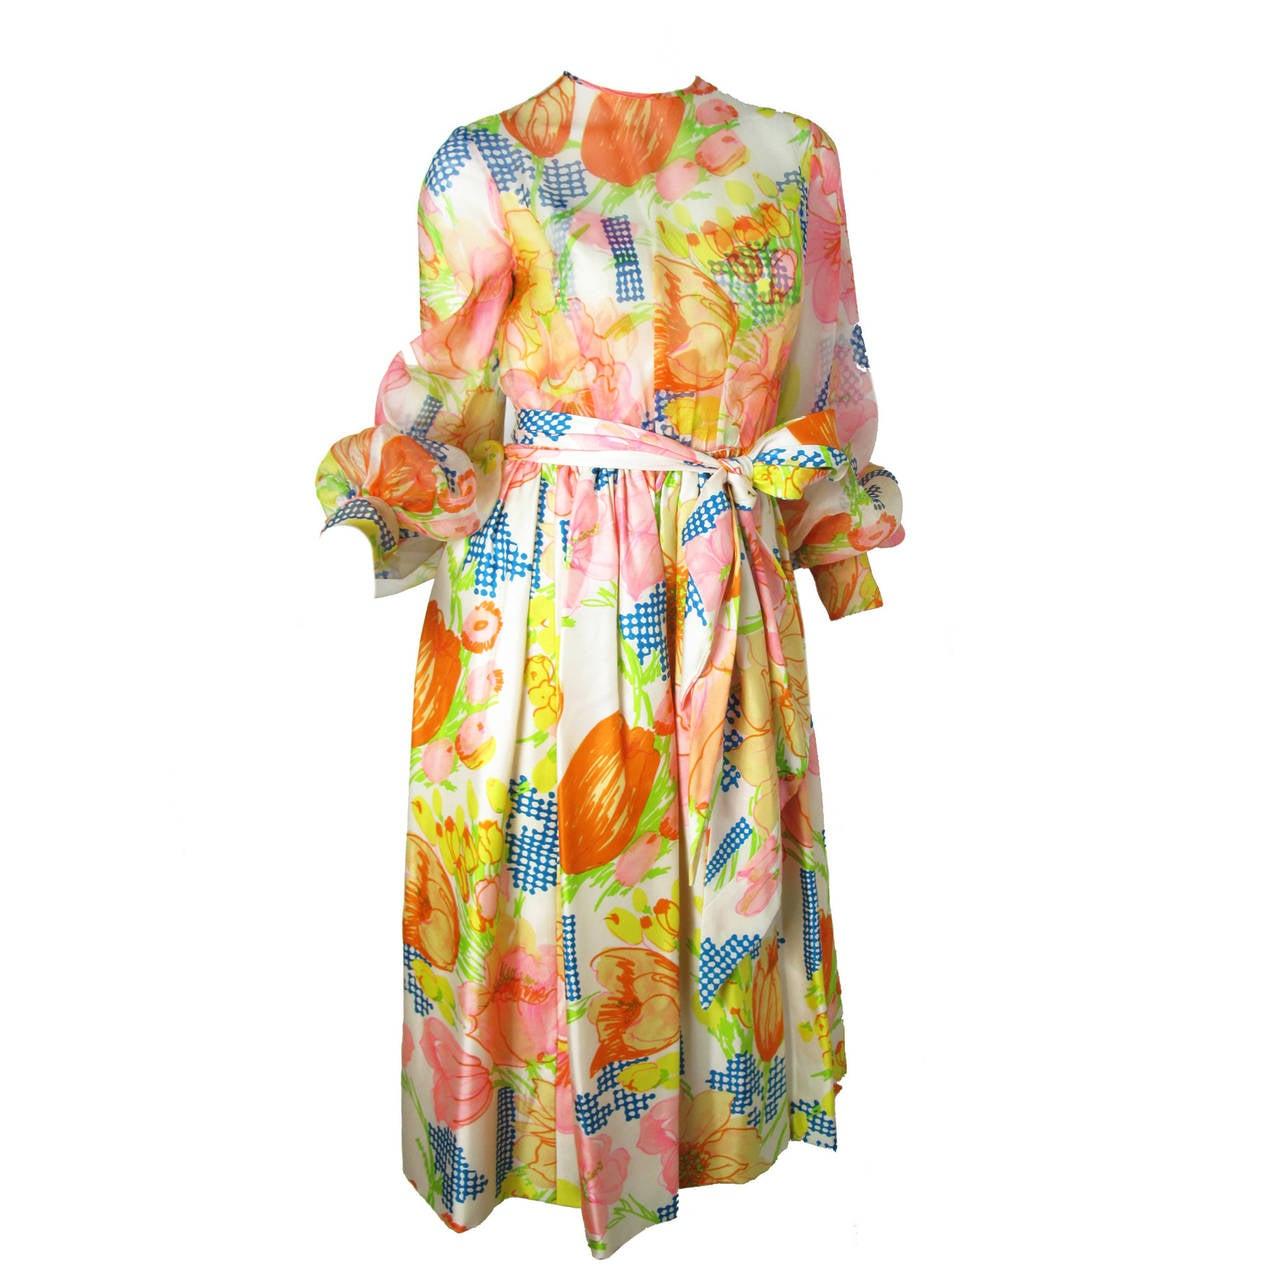 1960s Kiki Hart Floral Dress 1